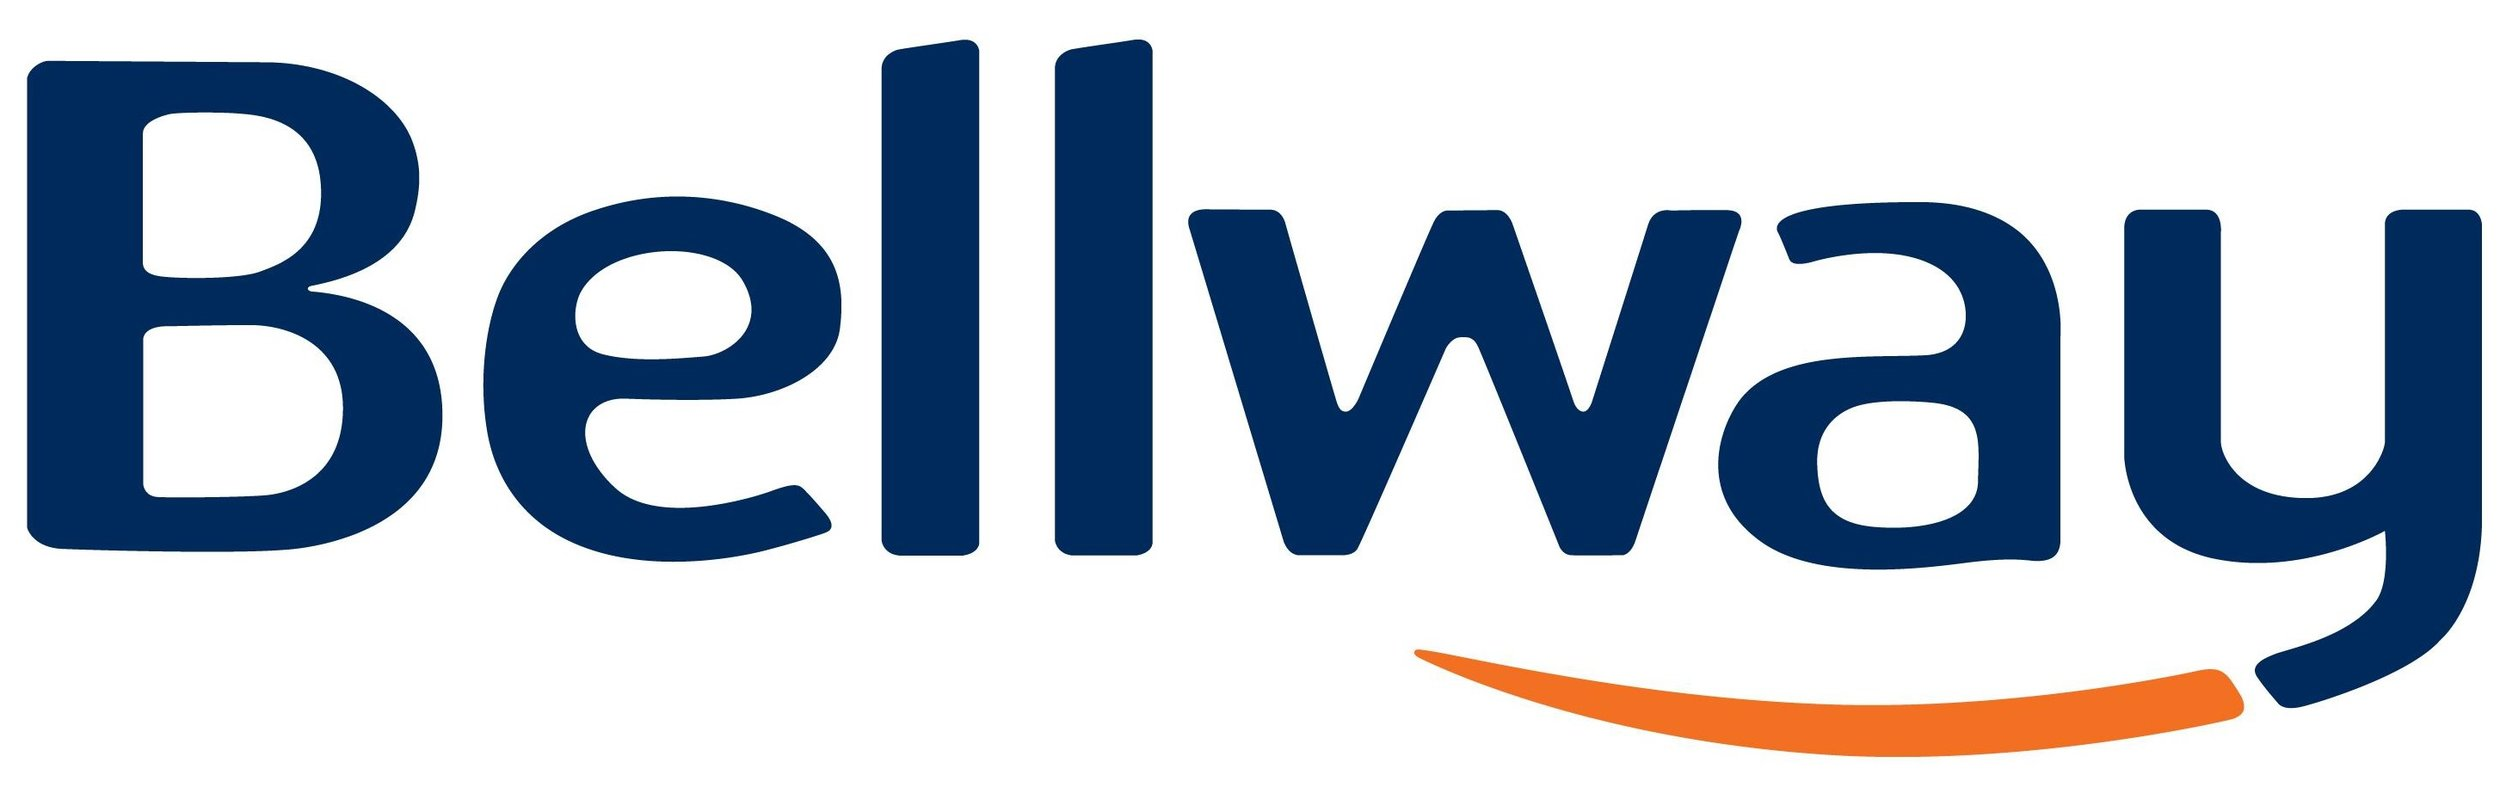 bellway_logo_300dpi1.jpg